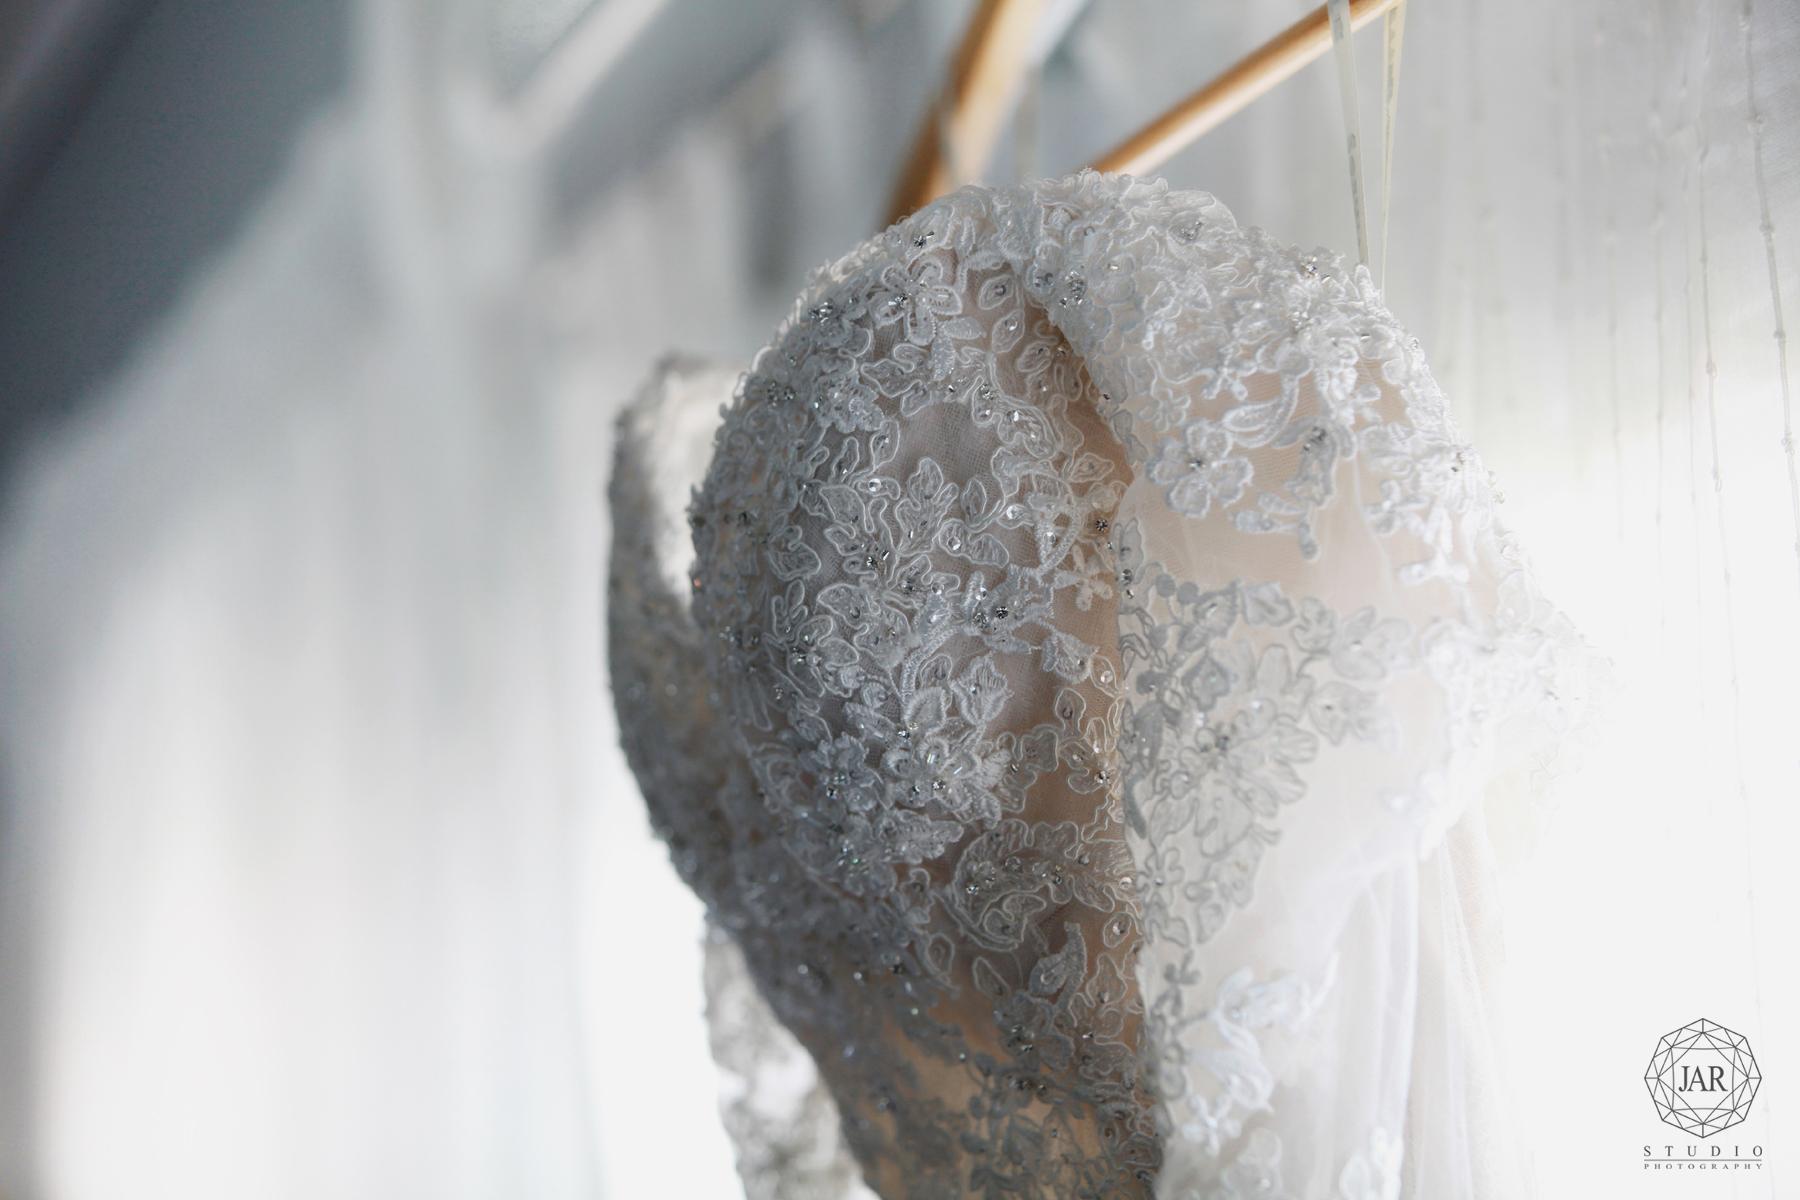 01-jarstudio-weddings-photography-elegant-dress-orlando.jpg